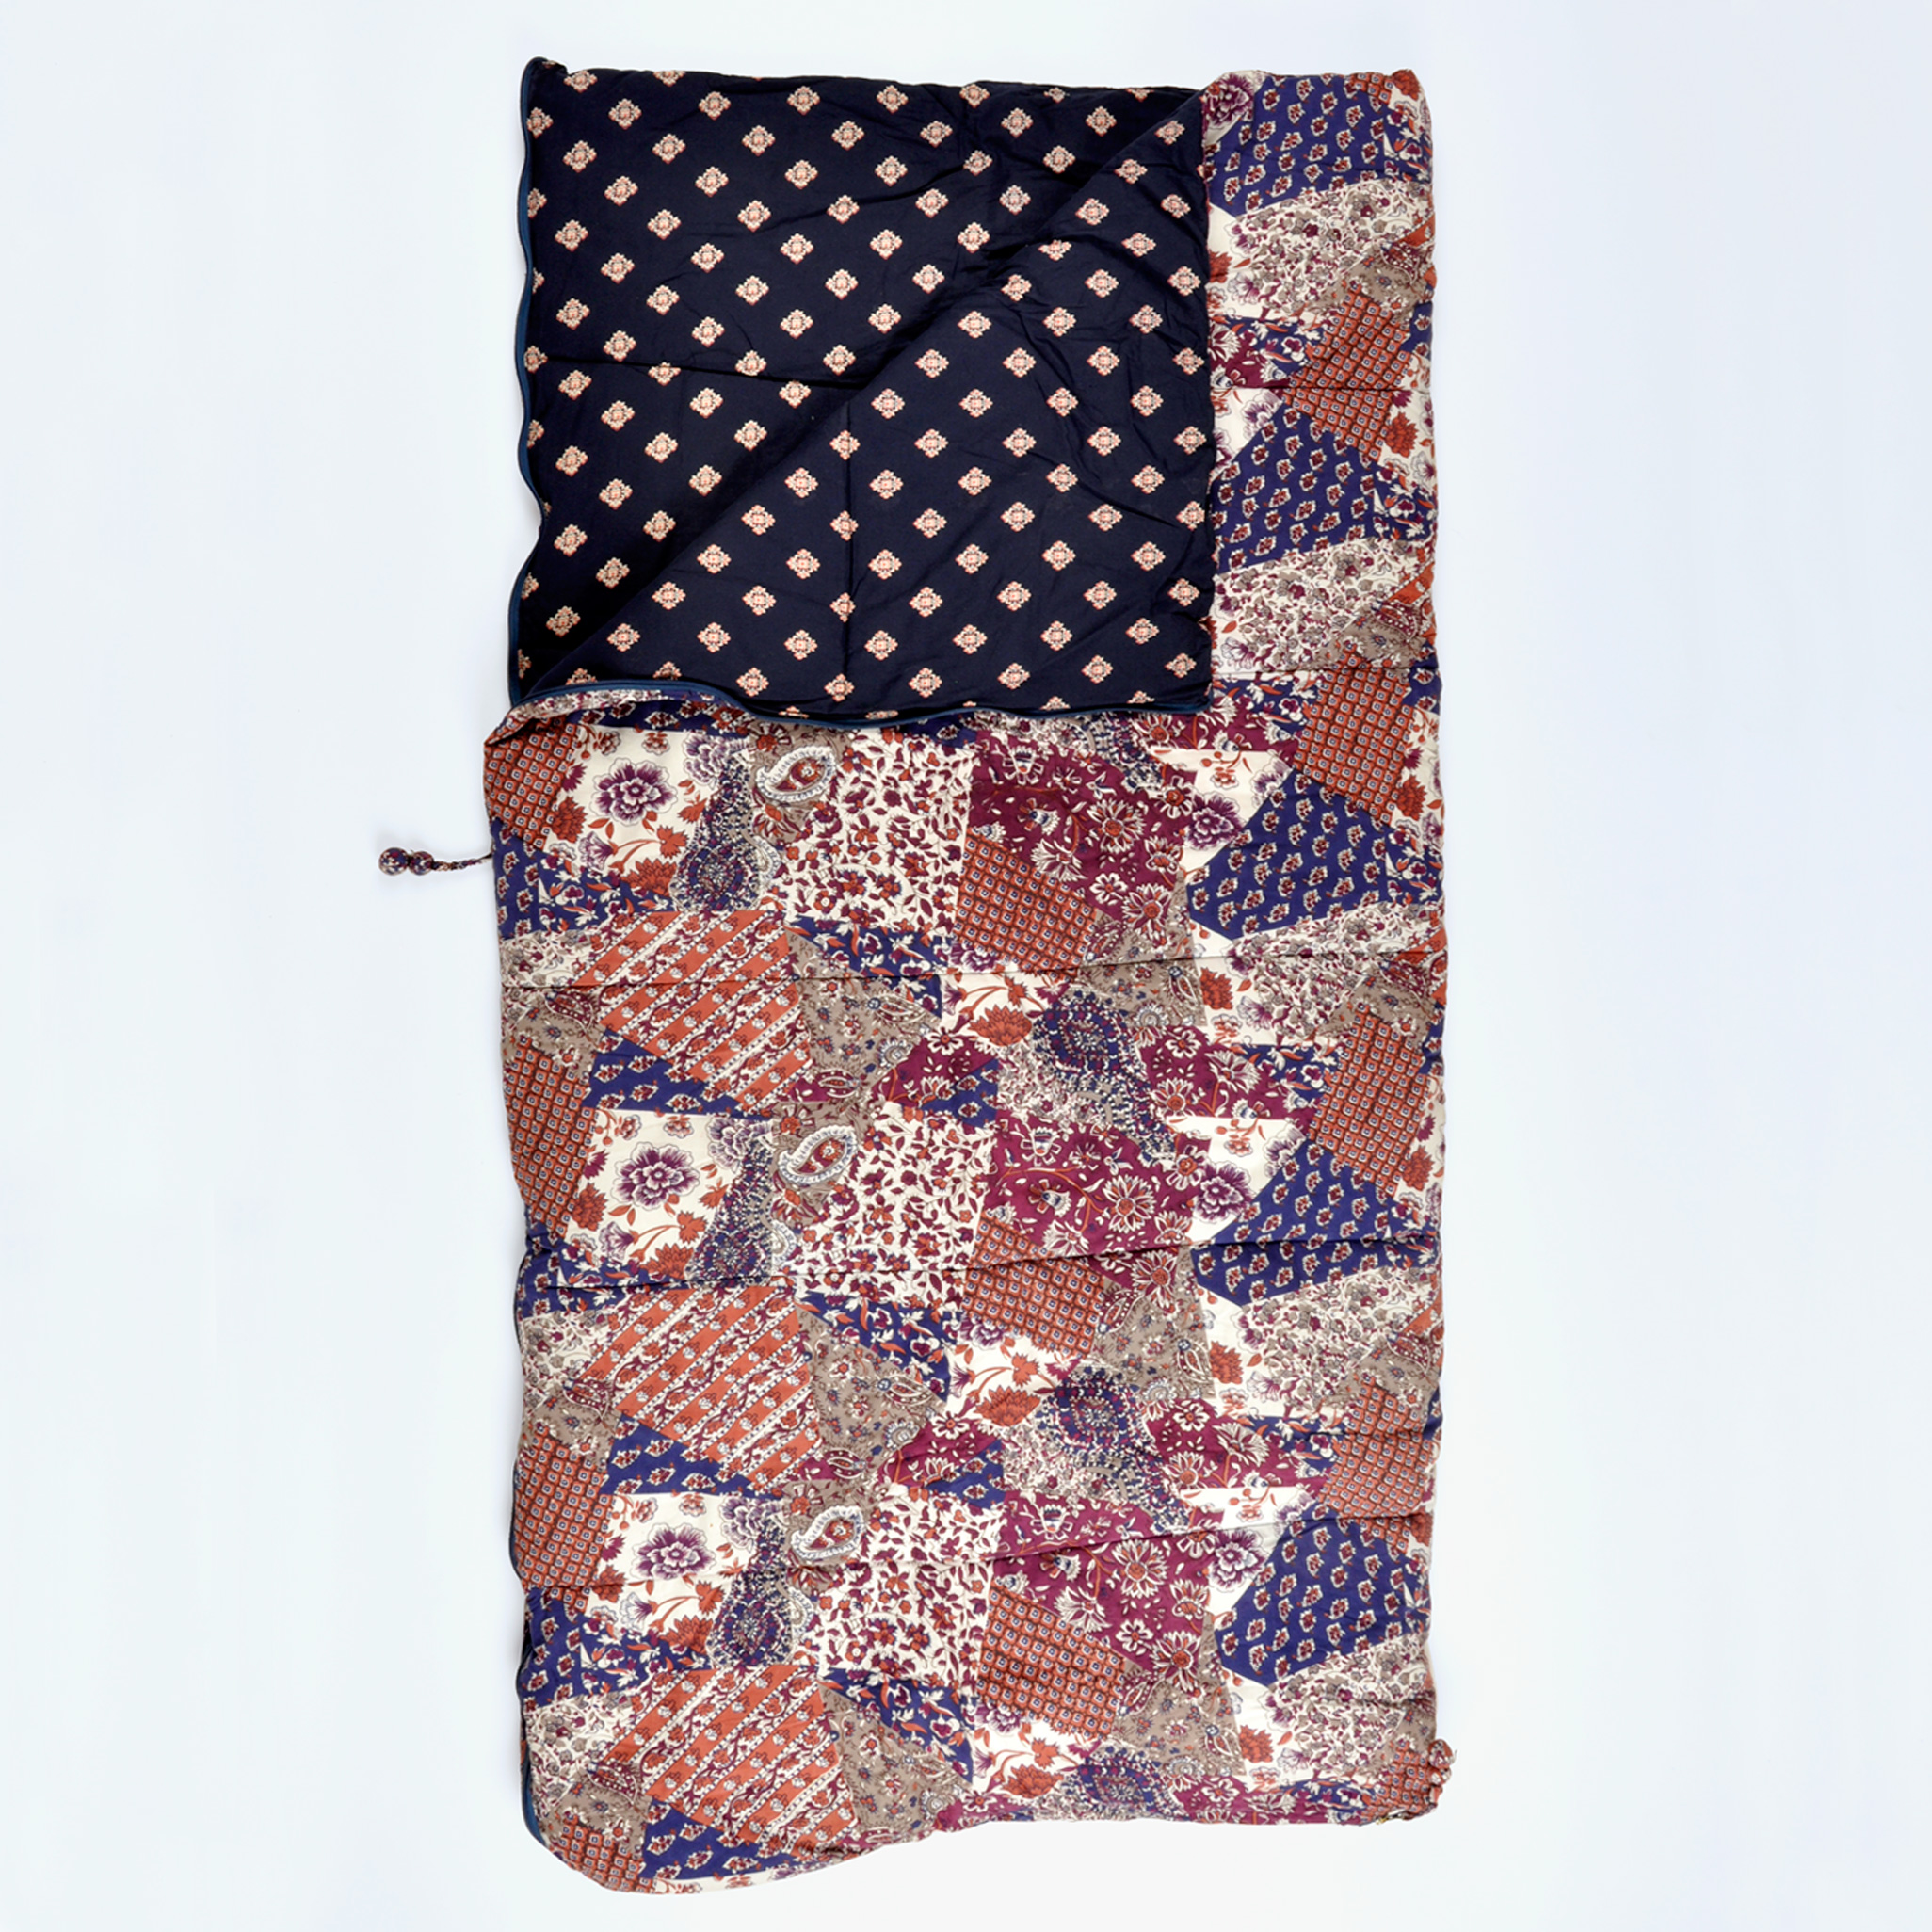 Vintage Patchwork single sleeping bag